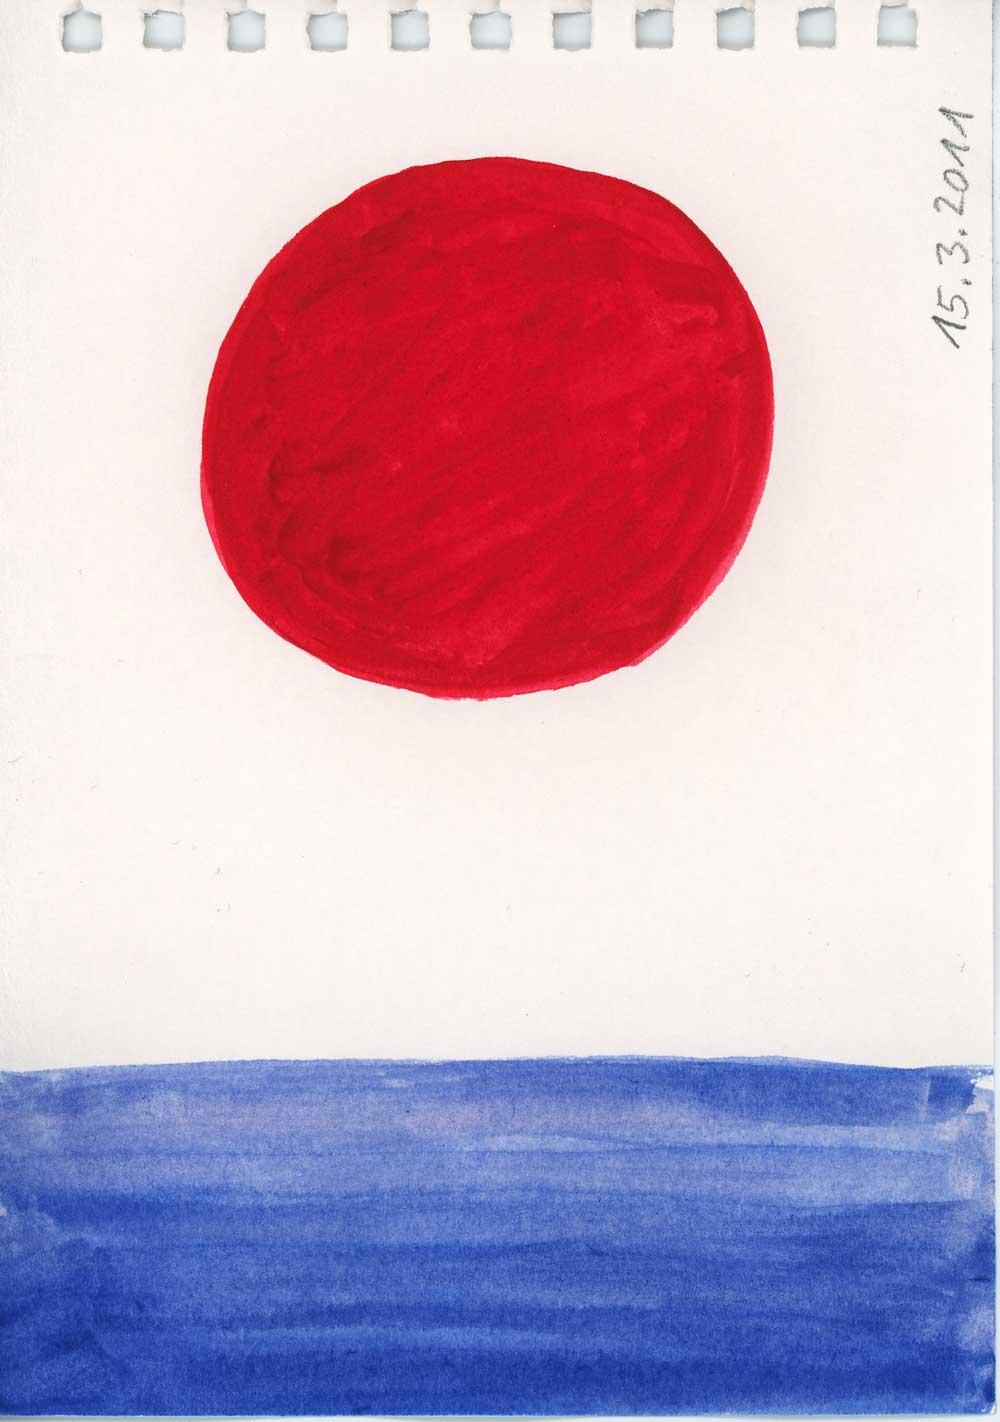 Be Creative #73 - Help Japan, © Ines Häufler, 2011